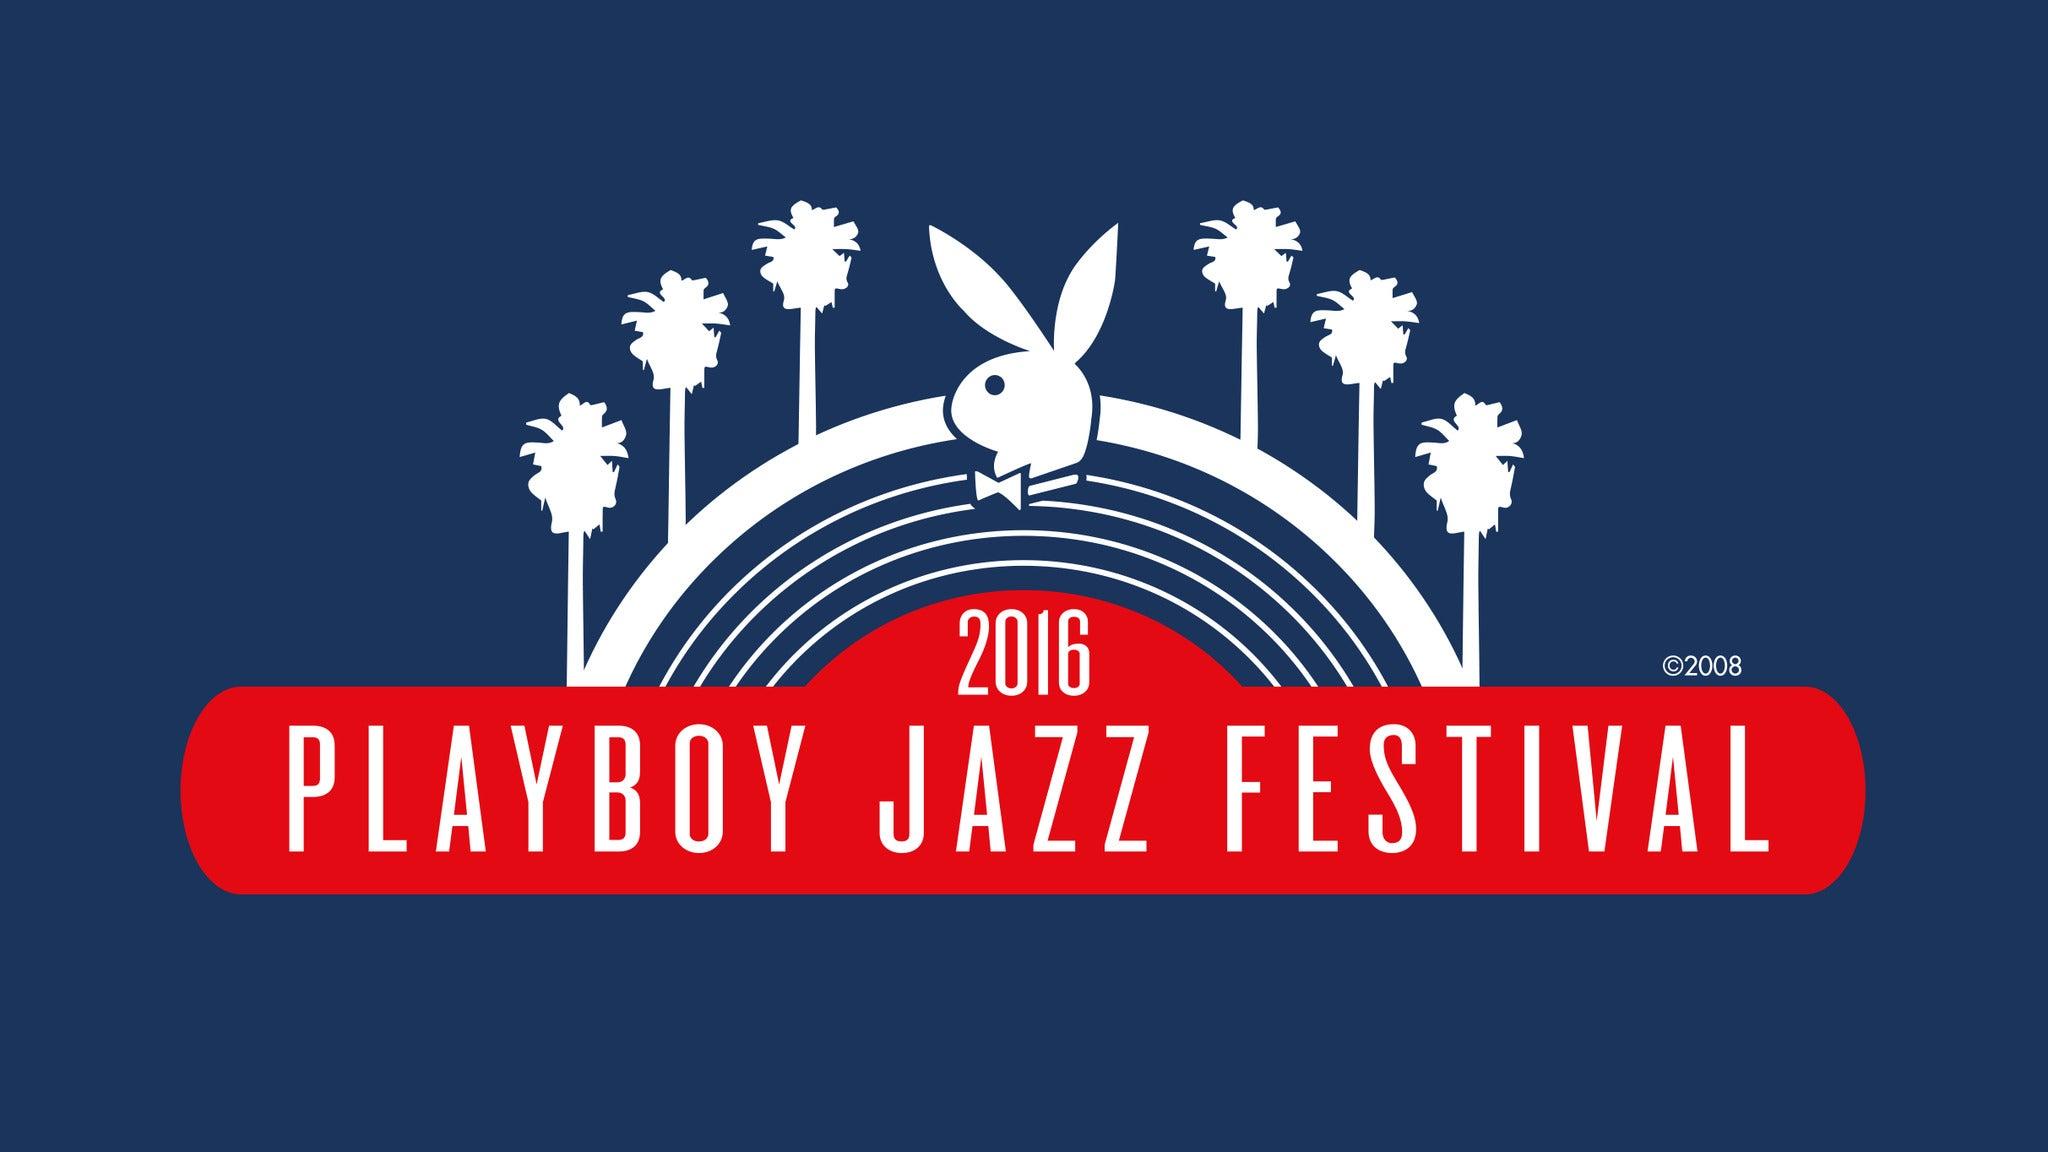 Playboy Jazz Festival at Hollywood Bowl